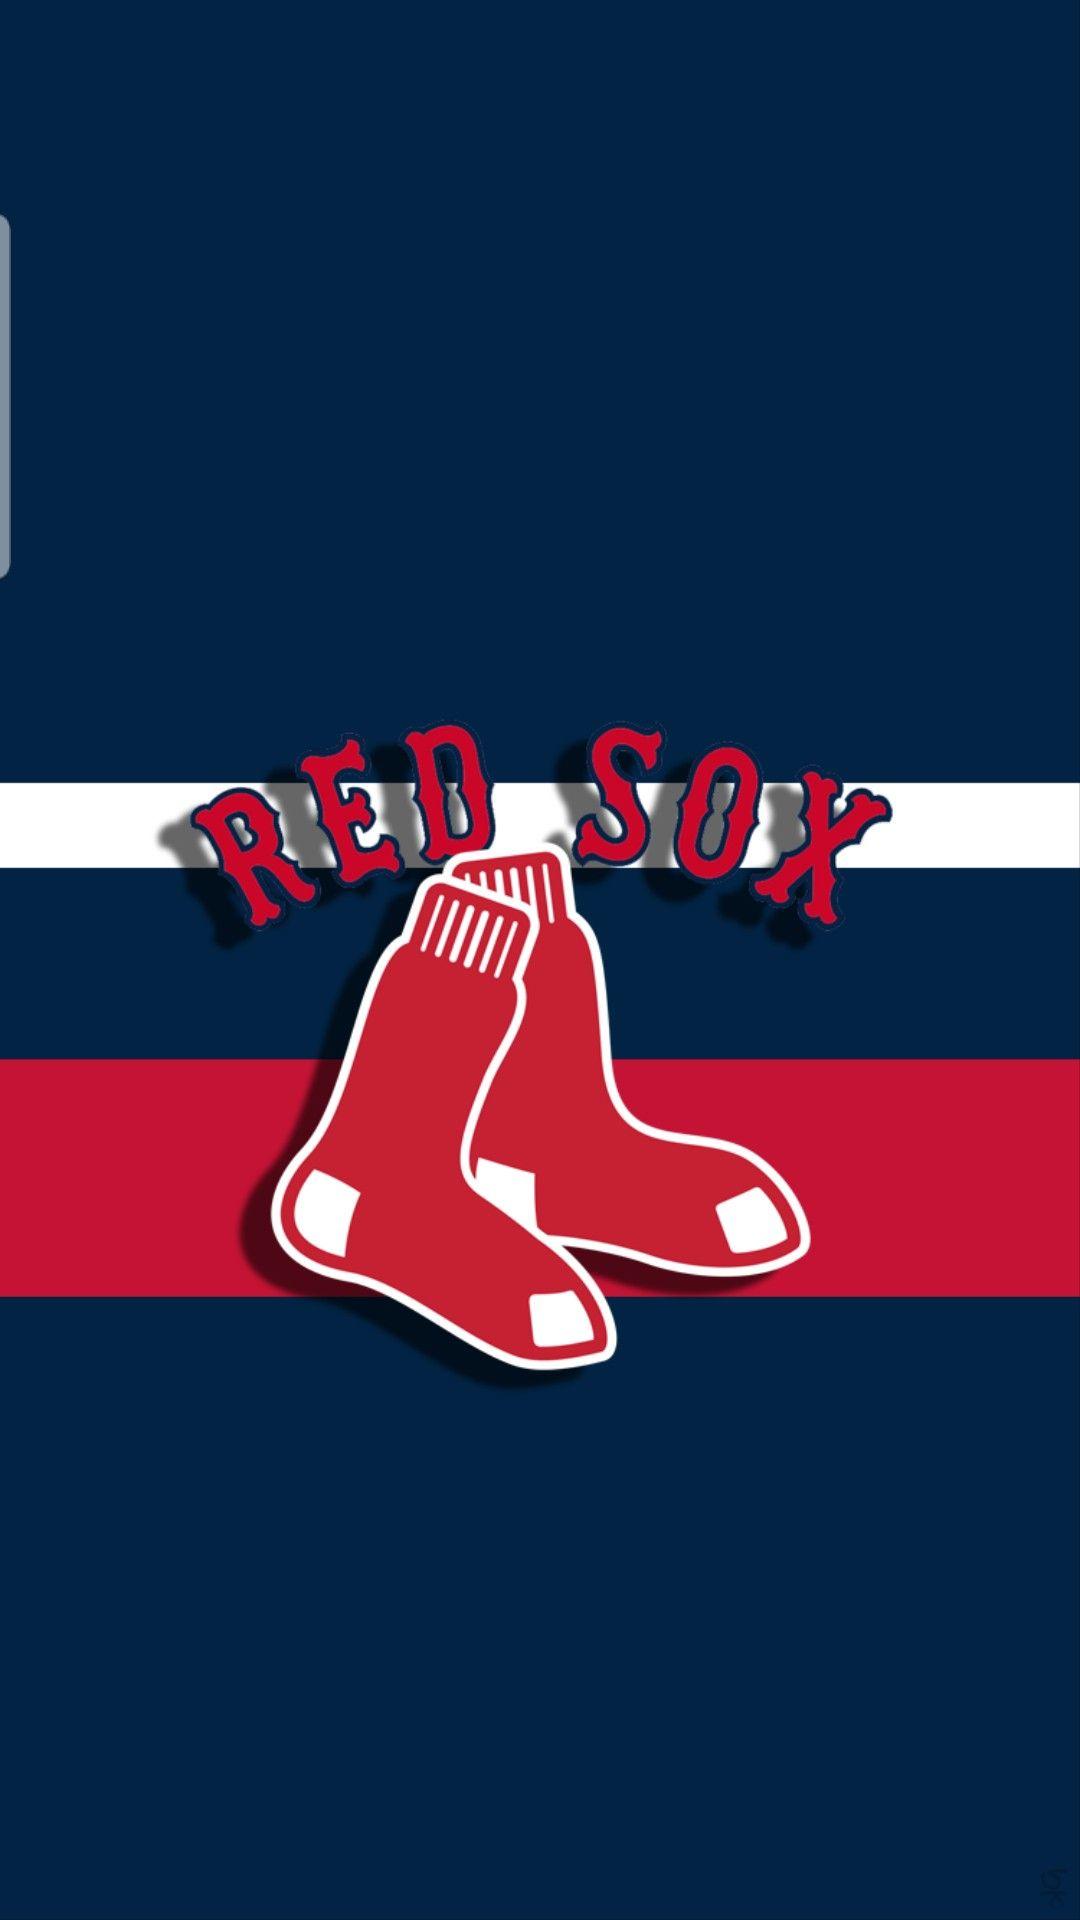 Pin By Archie Douglas On Sportz Wallpaperz Boston Red Sox Logo Boston Red Sox Wallpaper Red Sox Logo